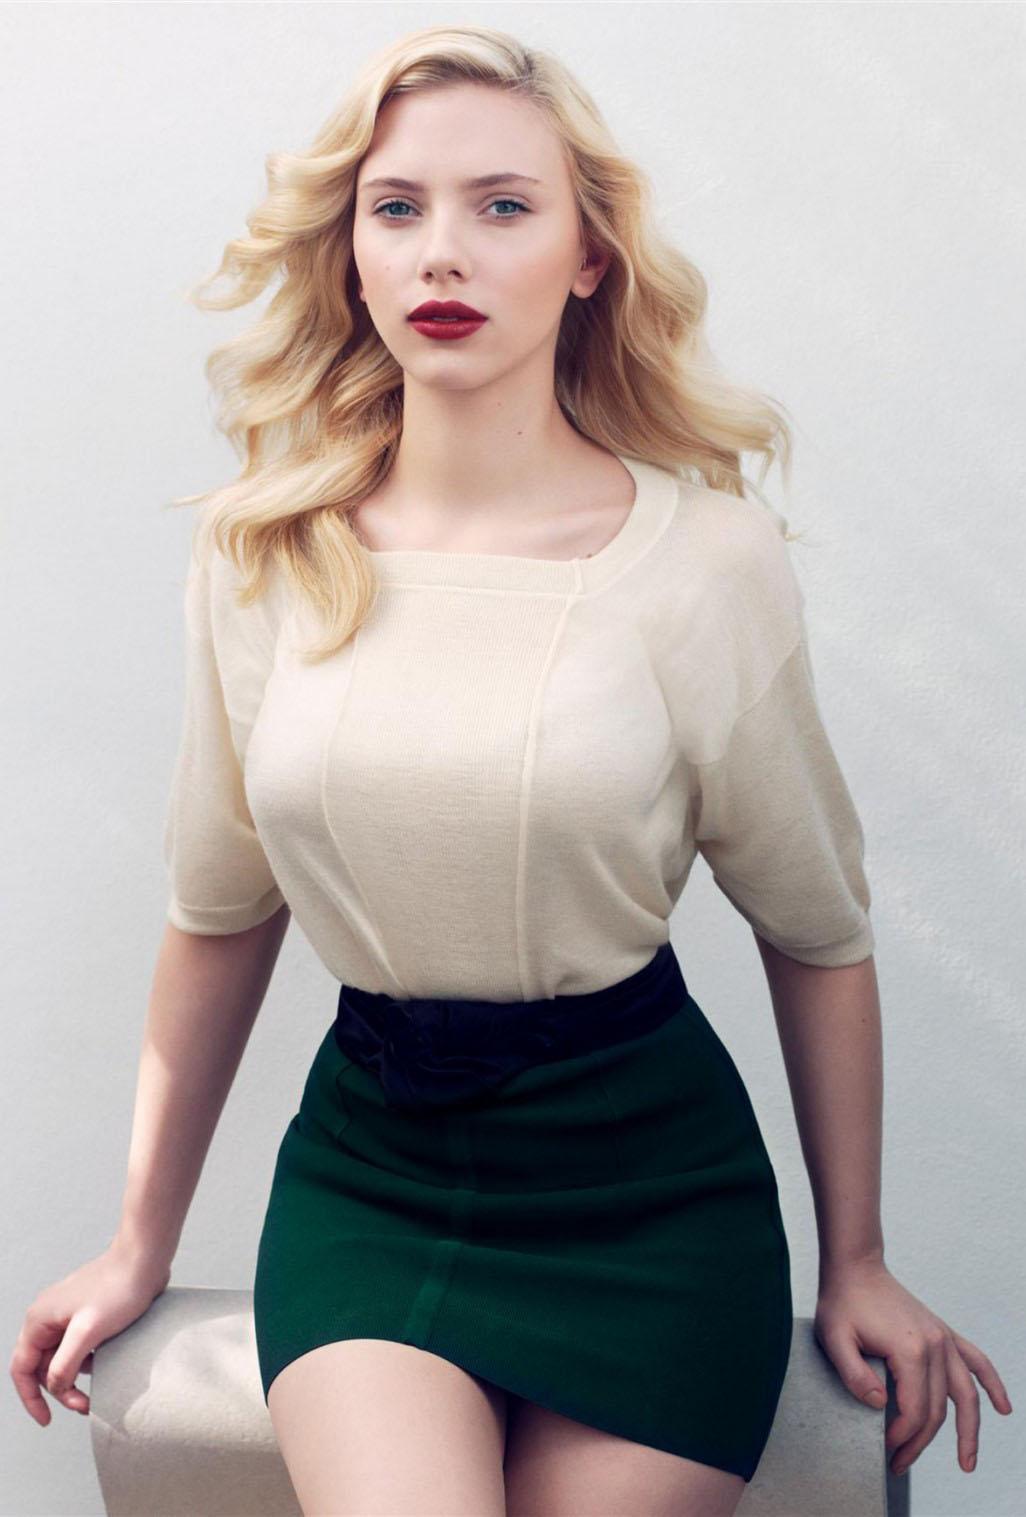 detail-bombshell-sexy-style-type-scarlettjohansson-miniskirt-white-blouse-green-hollywood-old-tinywaist-blonde-hair-wavy-red-lips-fairskin.jpg